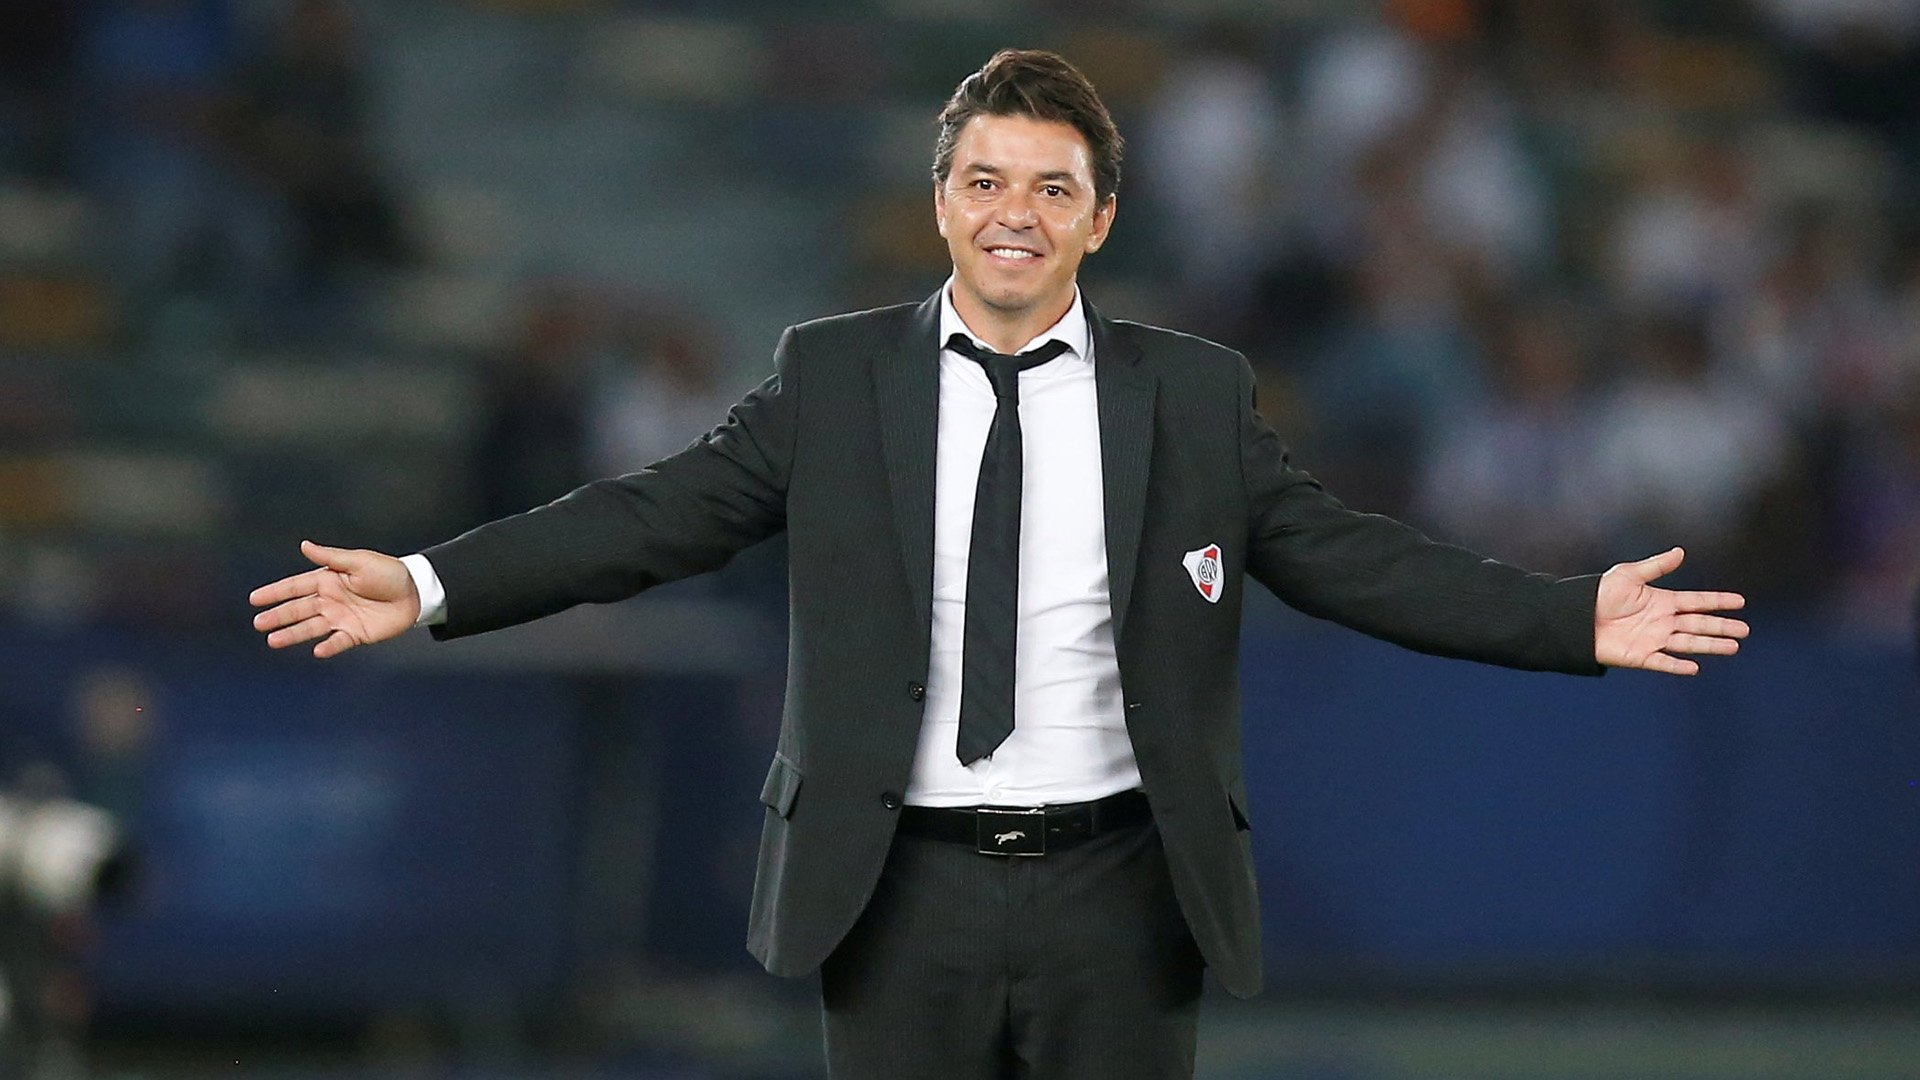 Marcelo GALLARDO talks about coaching the Argentina national team | Mundo  Albiceleste